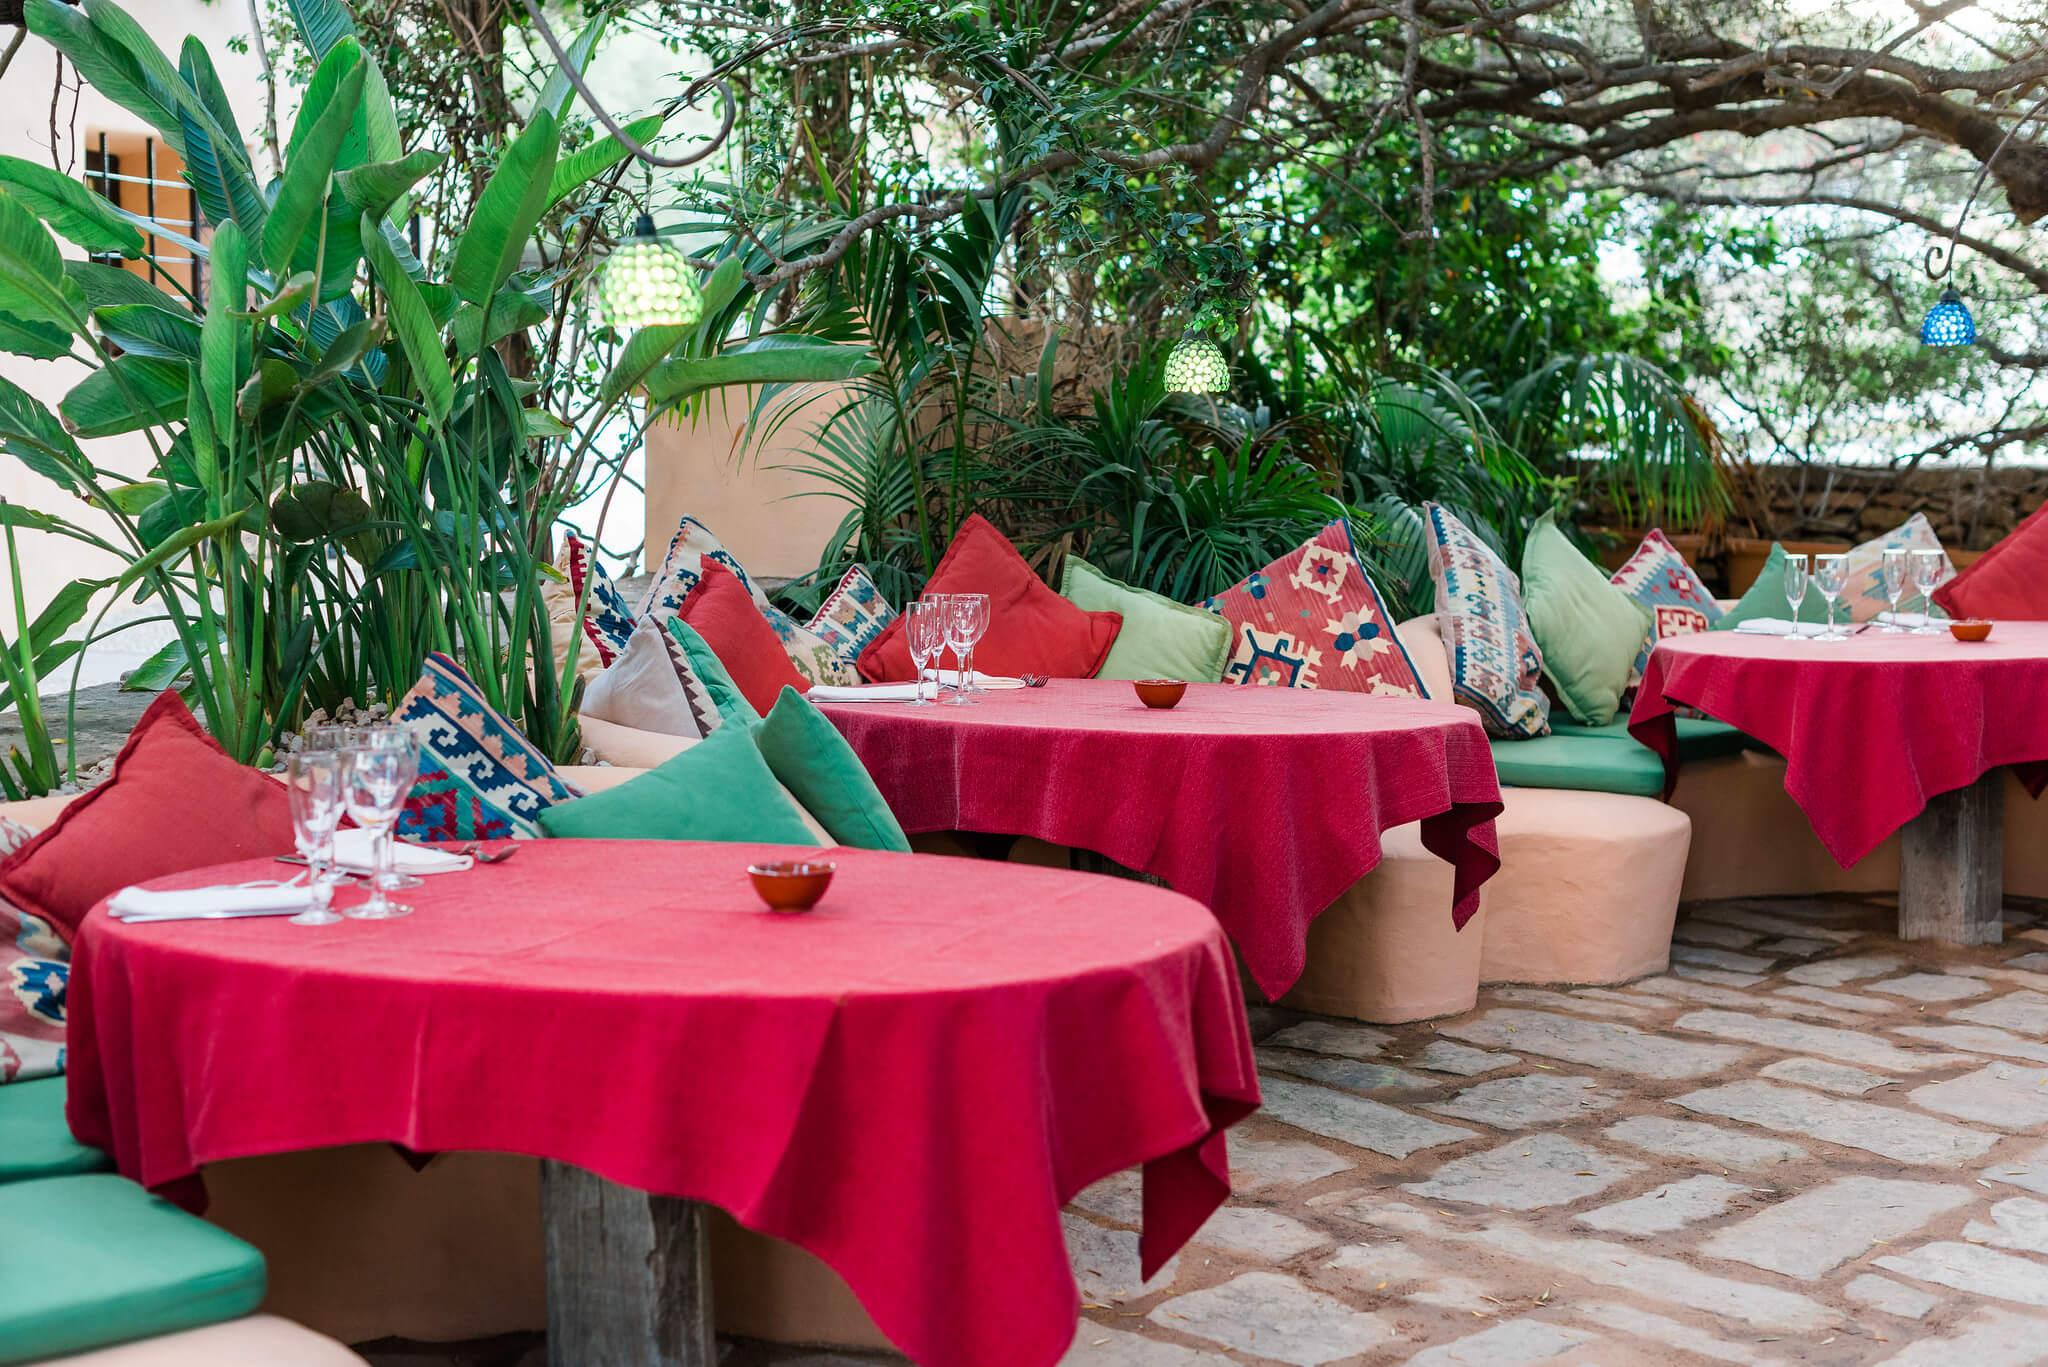 https://www.white-ibiza.com/wp-content/uploads/2020/03/formentera-restaurants-can-carlos-2020-06.jpg